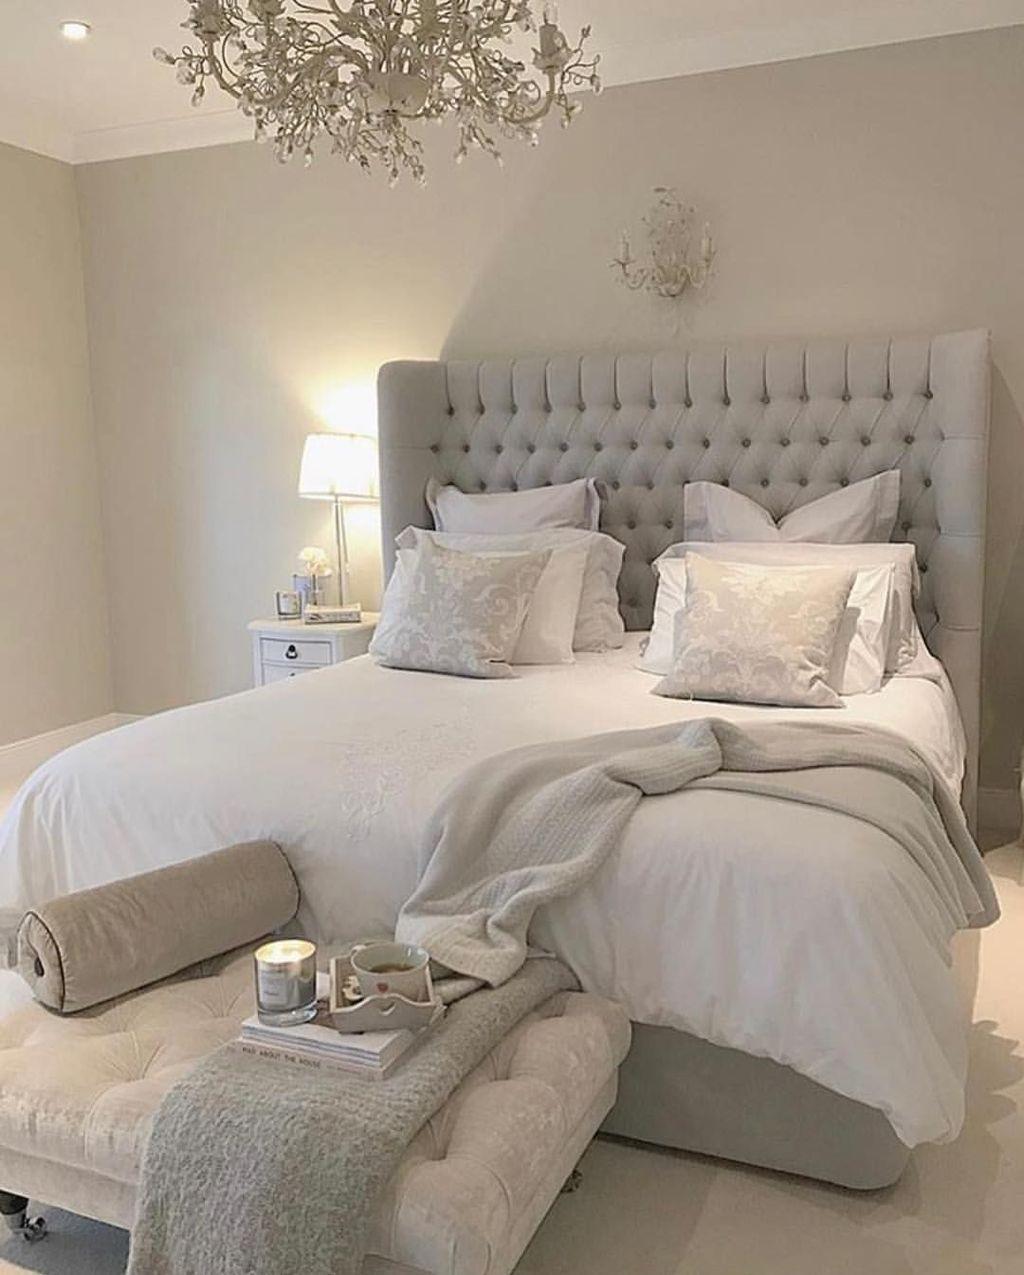 Cool 47 Stylish Master Bedroom Design Ideas Budget Stylish Master Bedrooms Serene Bedroom Bedroom Design